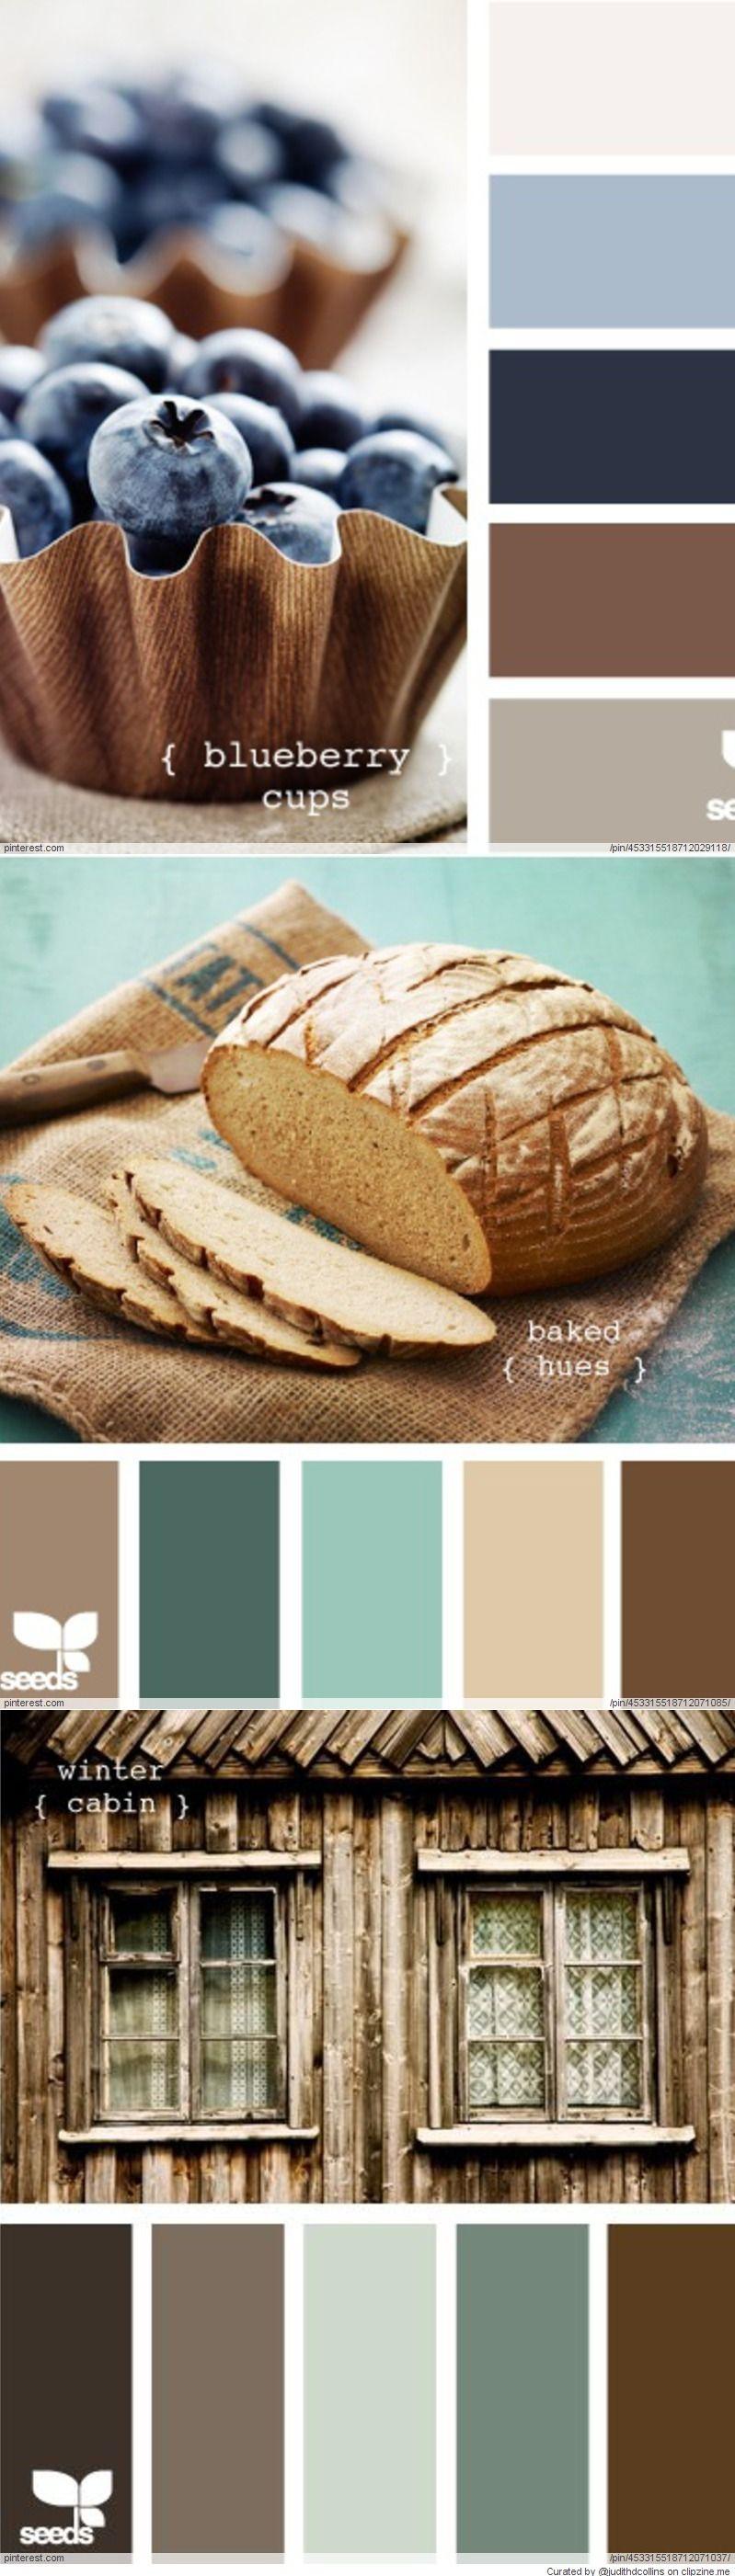 colorscheme farben colors pinterest farben wandfarbe und palette. Black Bedroom Furniture Sets. Home Design Ideas